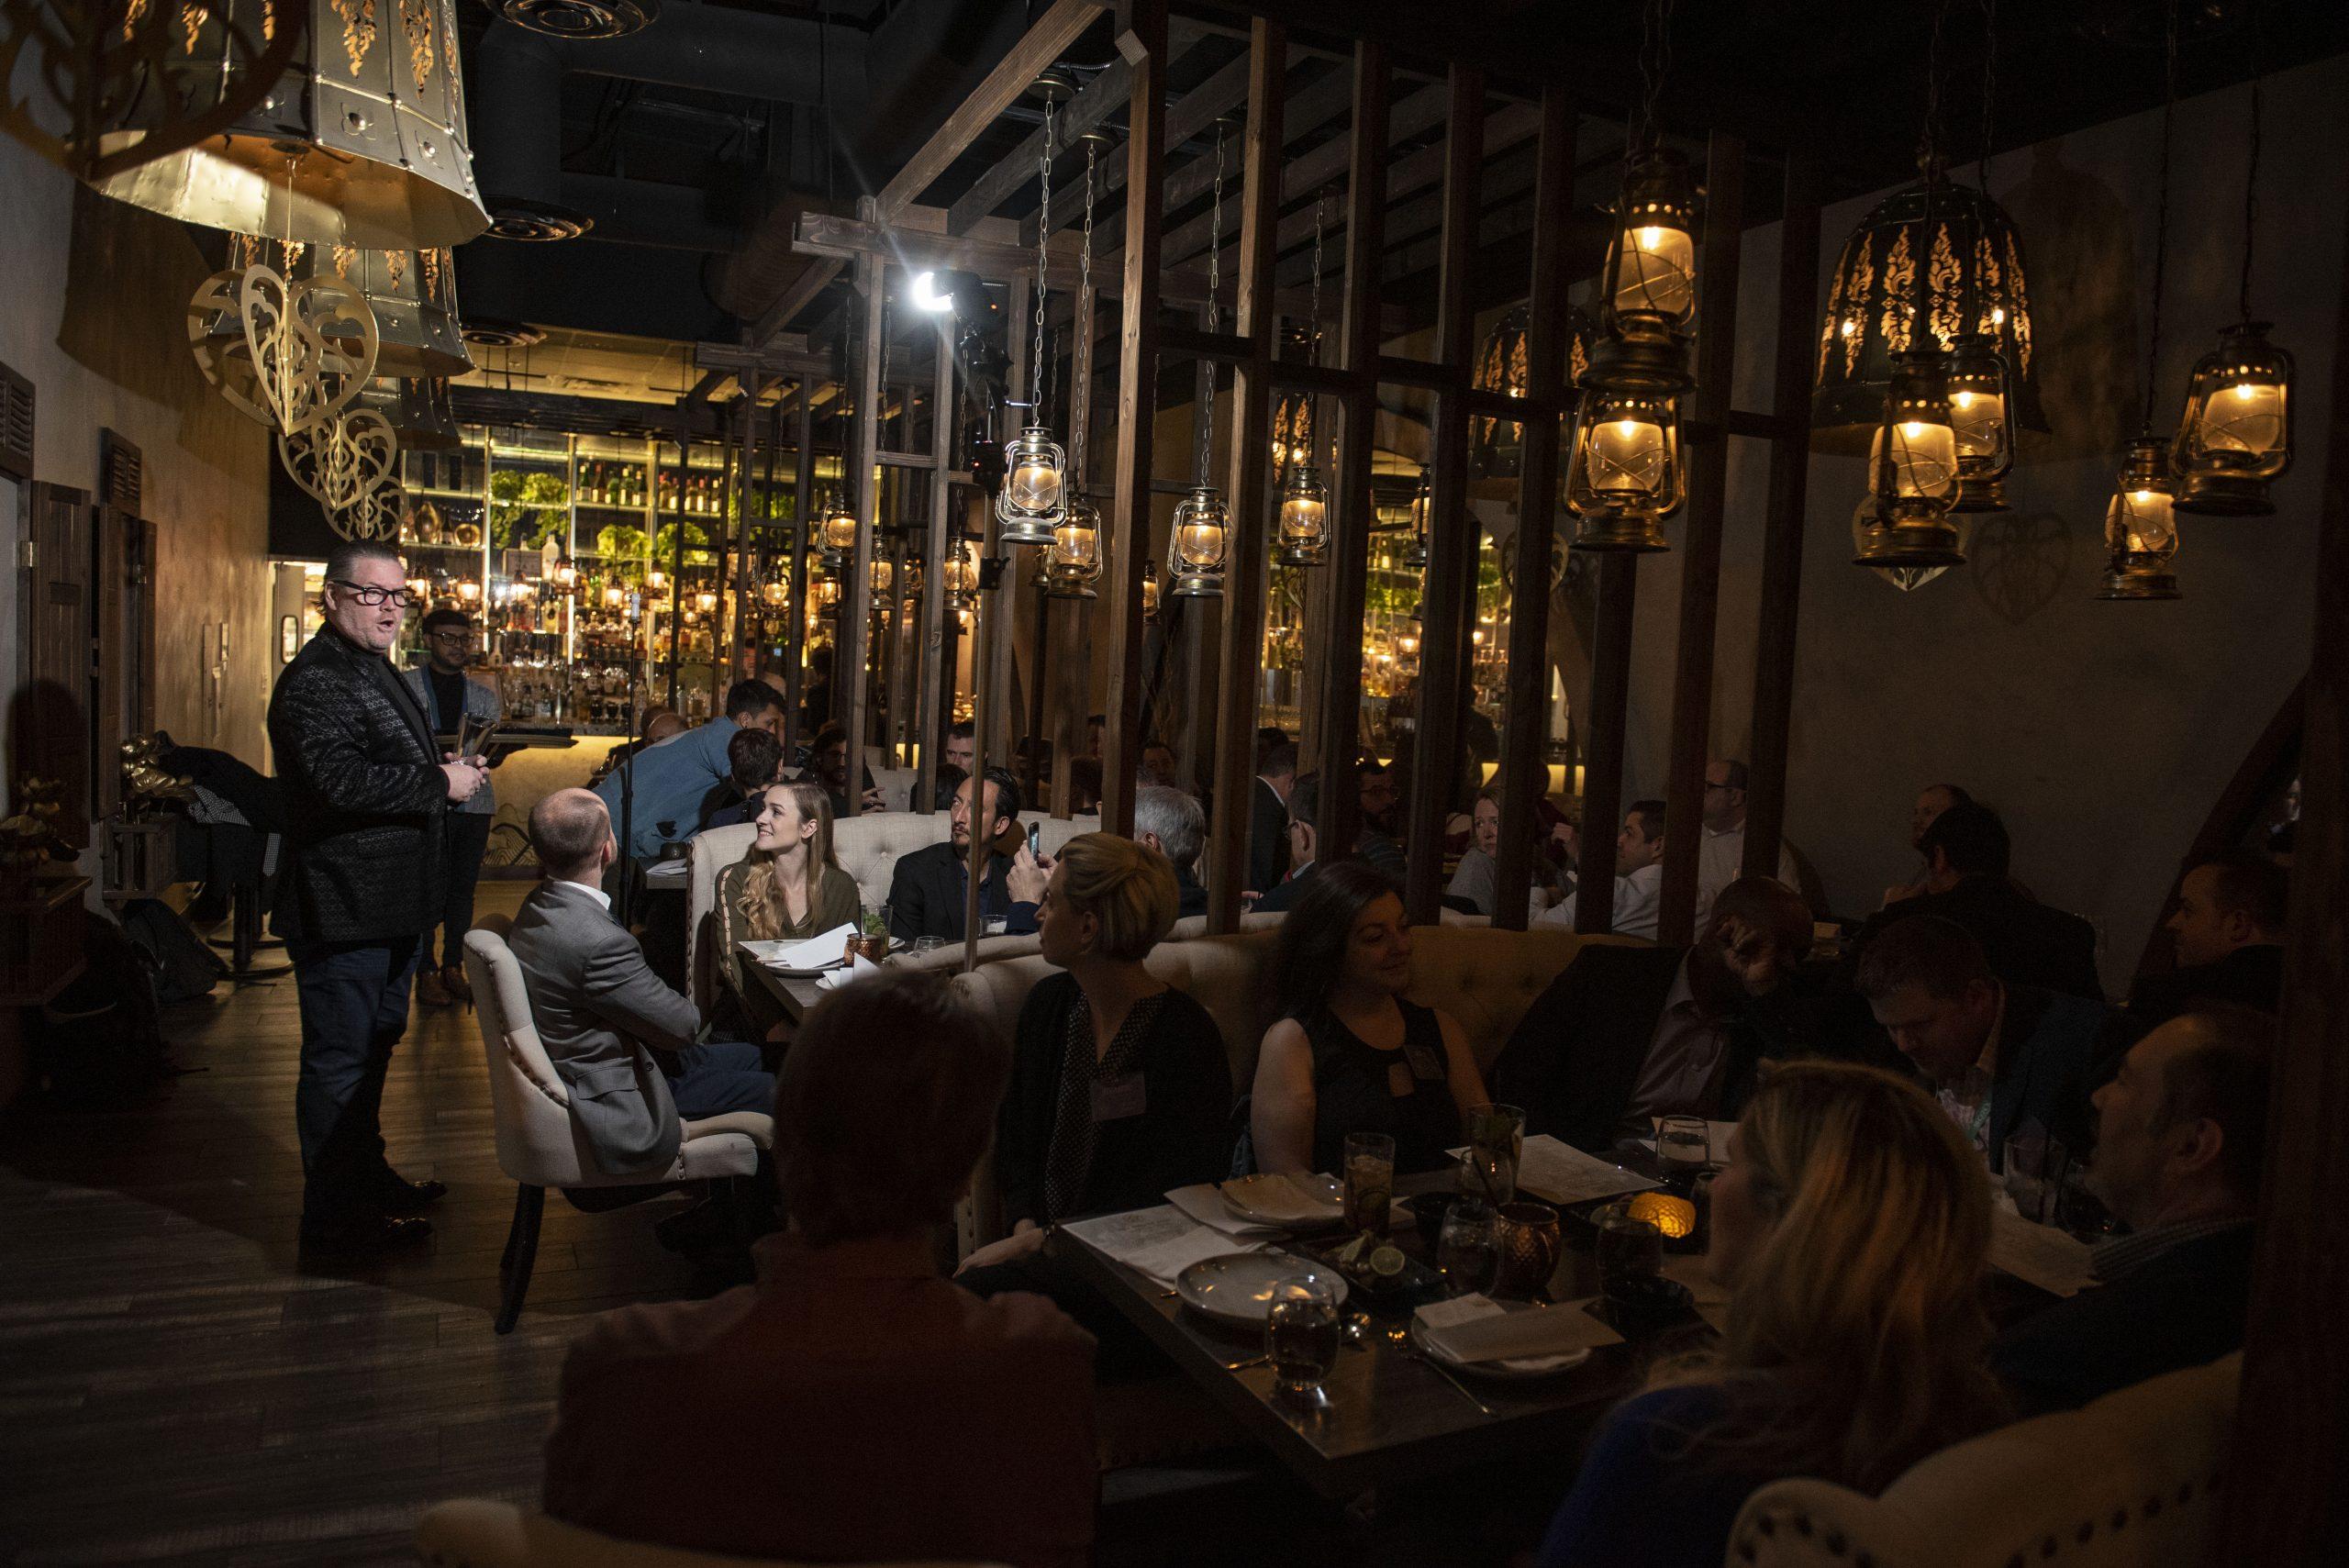 The Hospitality Hacks & Pundits Dinner at Lamaii in Las Vegas